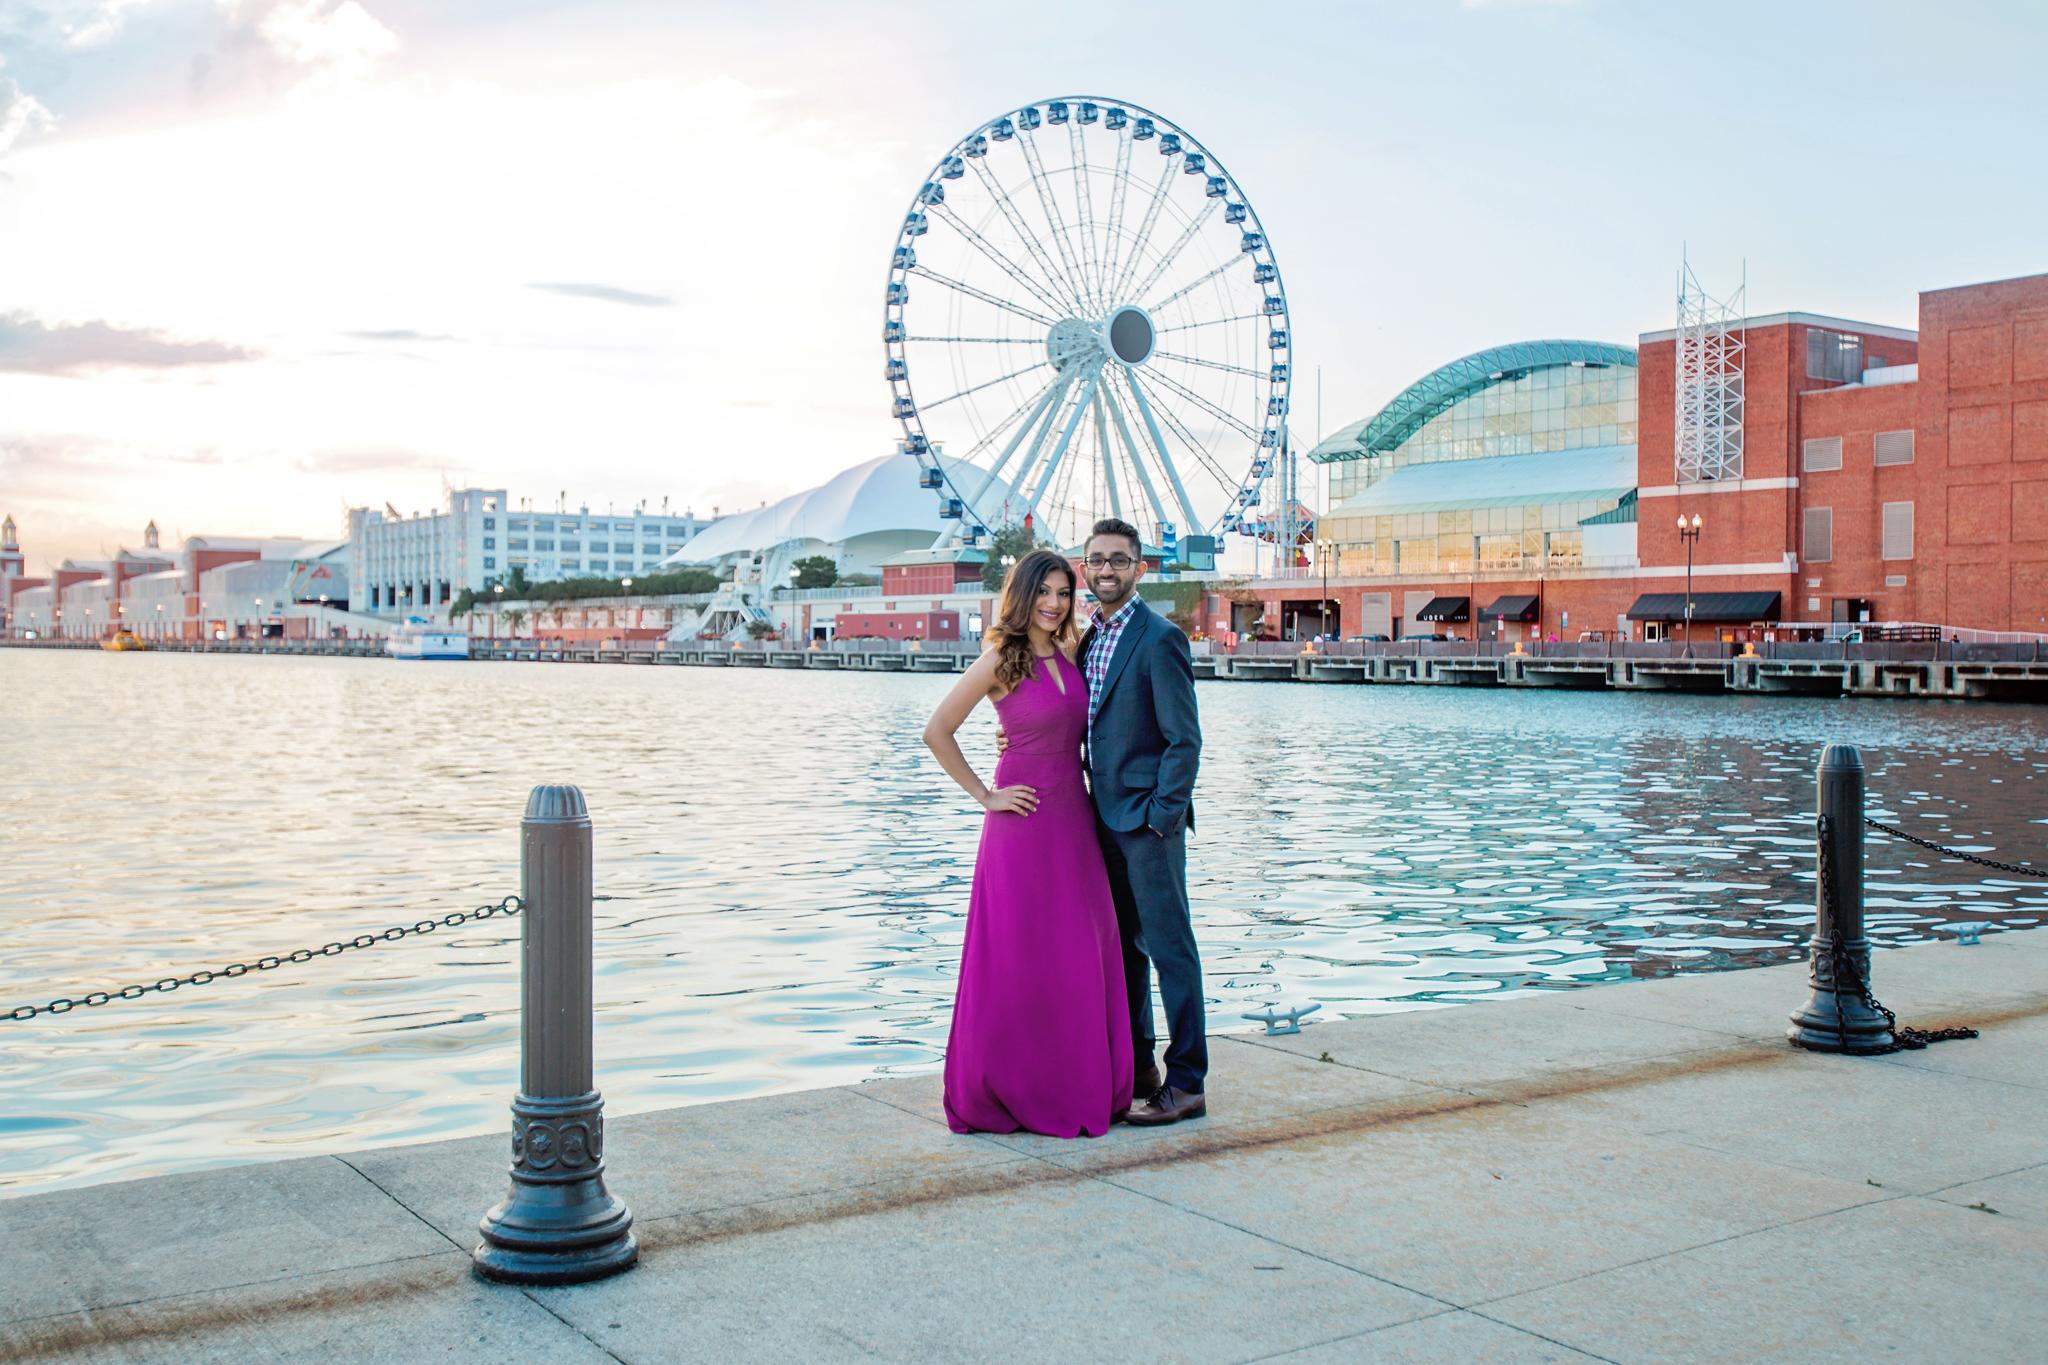 Navy Pier - A Chicago Landmark